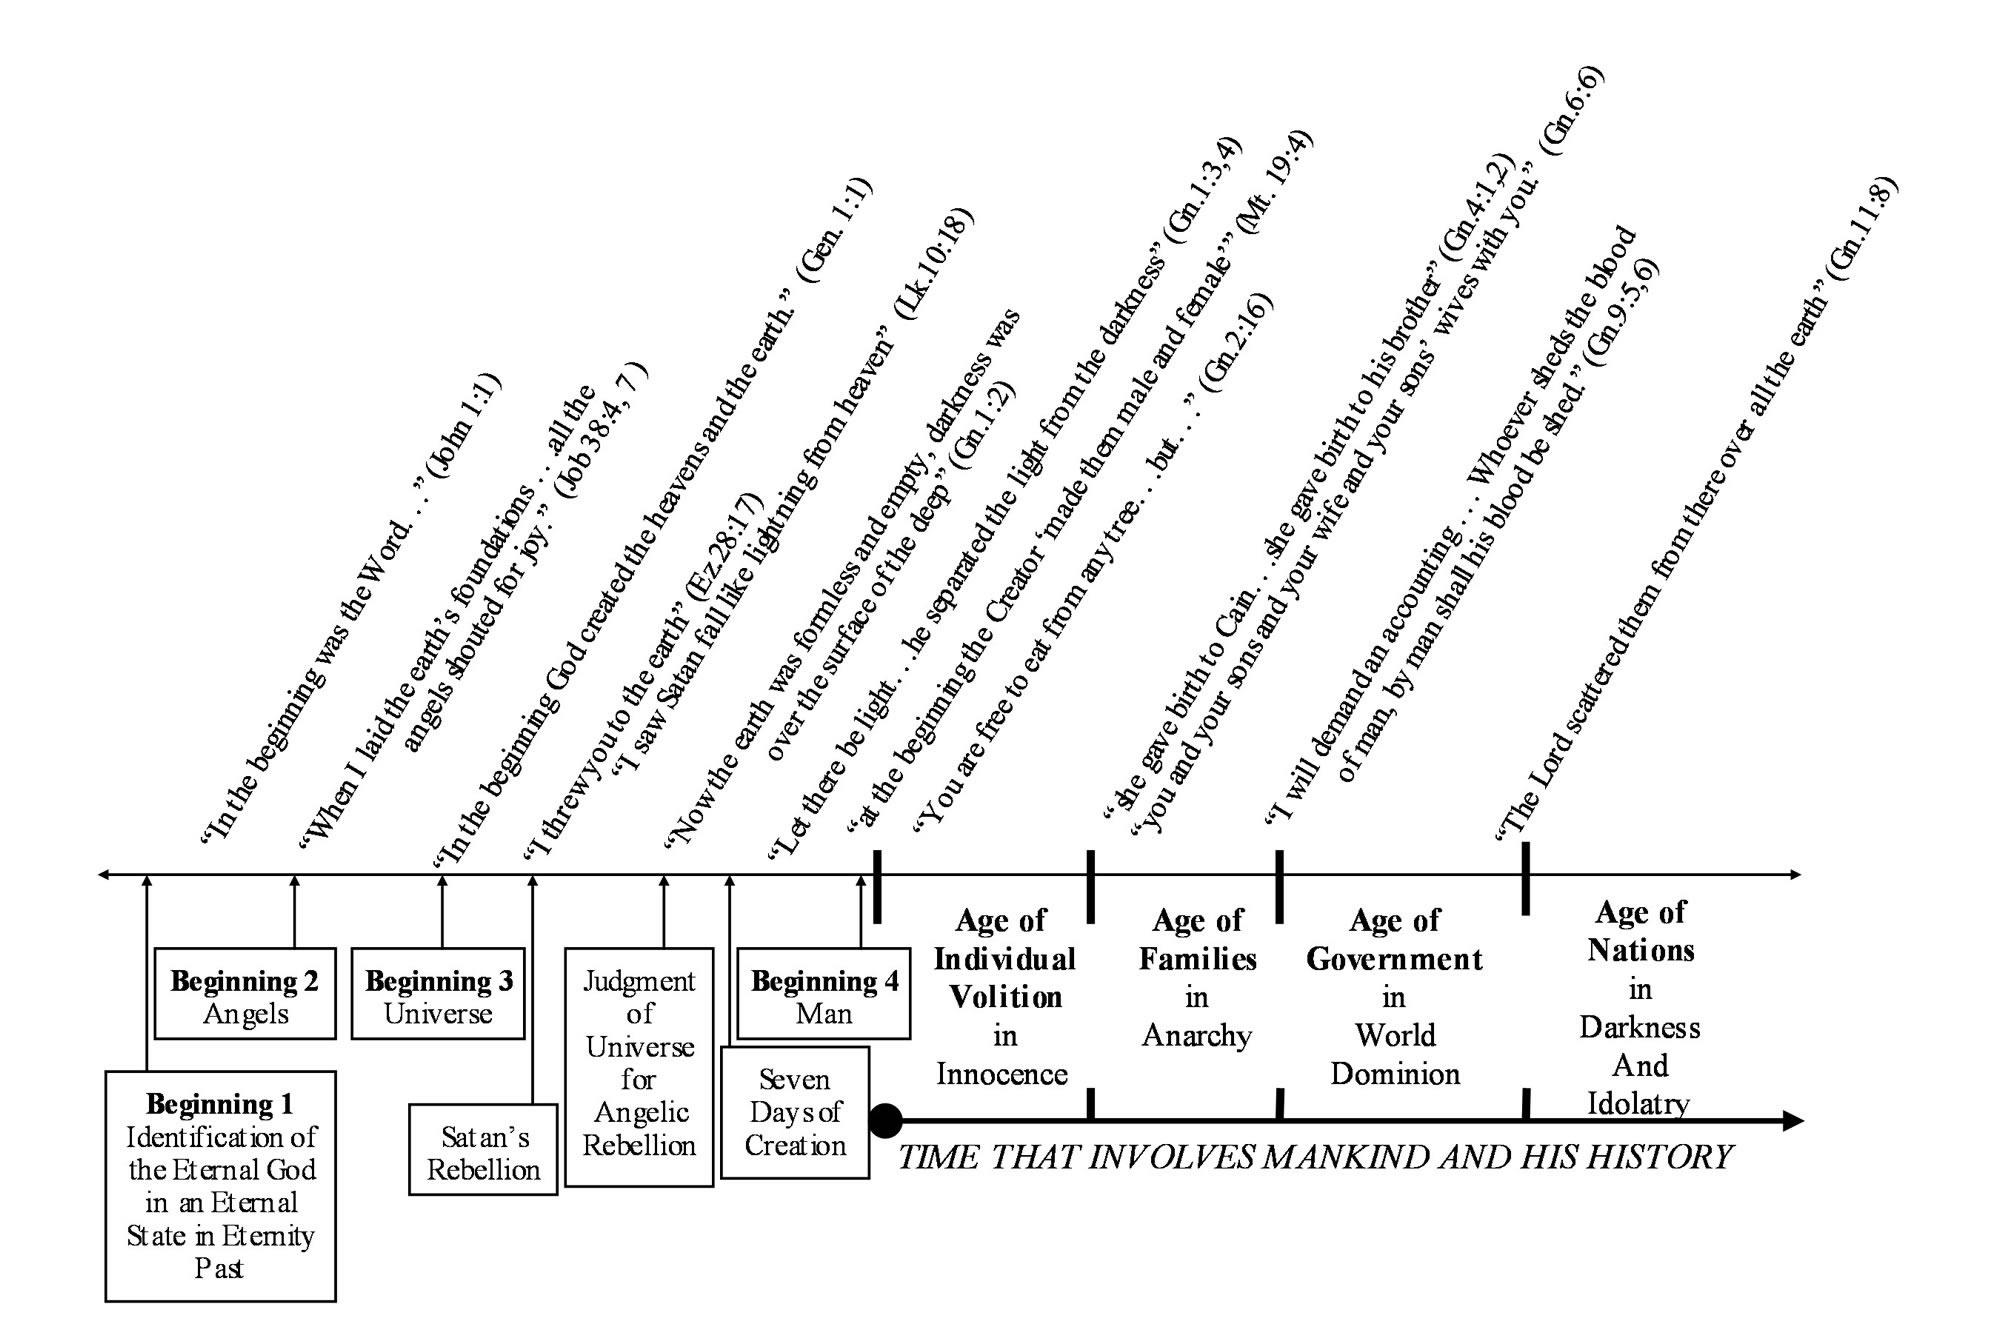 5 ohm telegraph wiring diagram